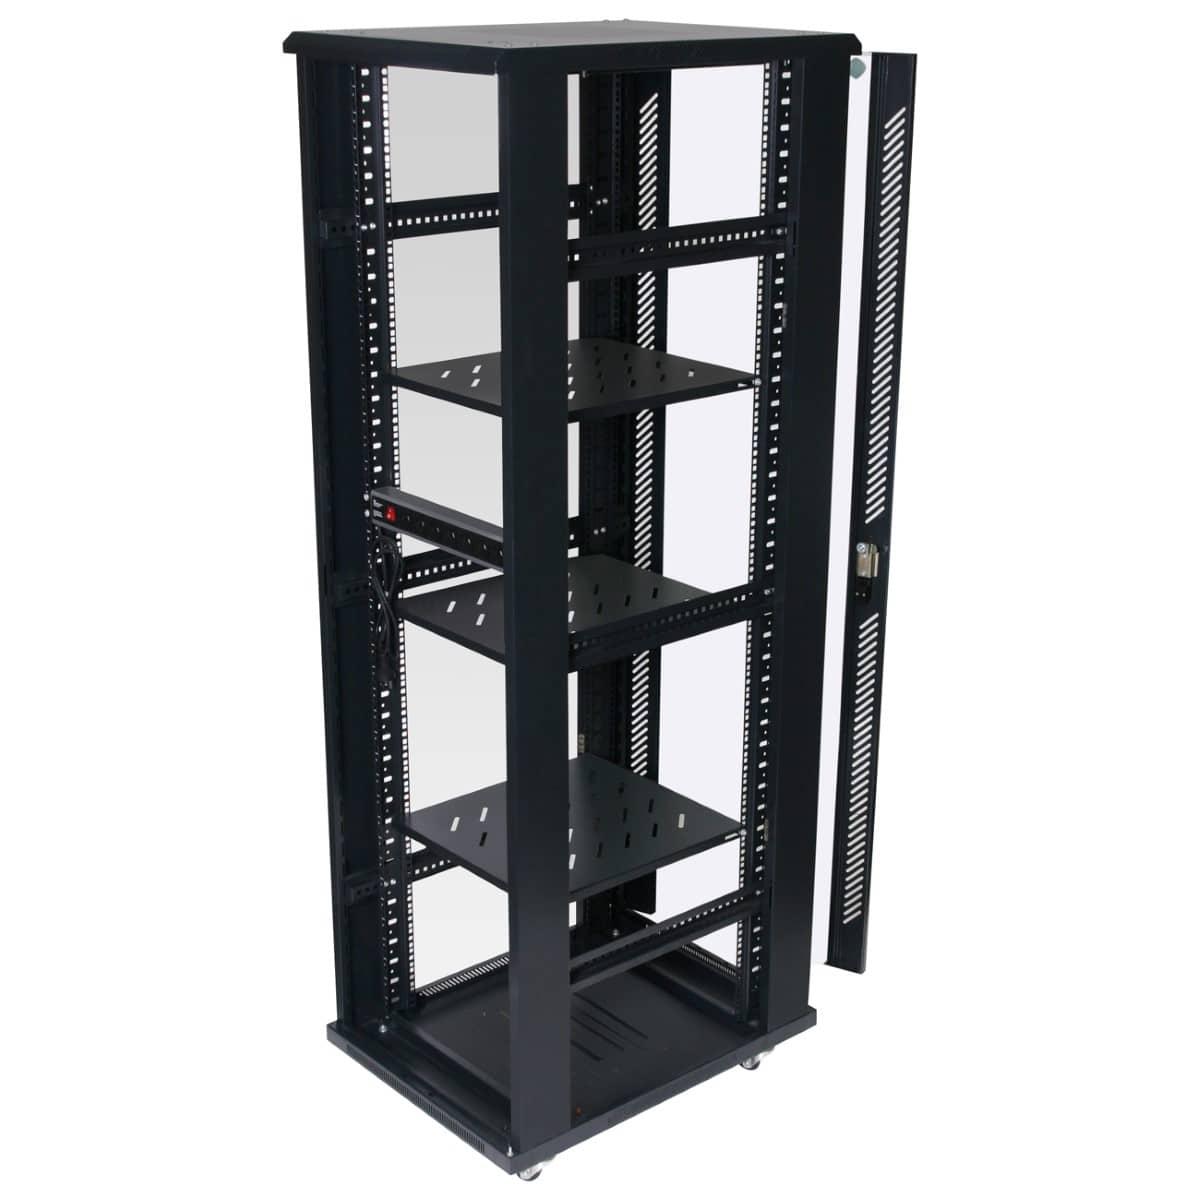 42ru 600mm deep x 600mm wide rack cabinet hcc for 100 floors floor 42